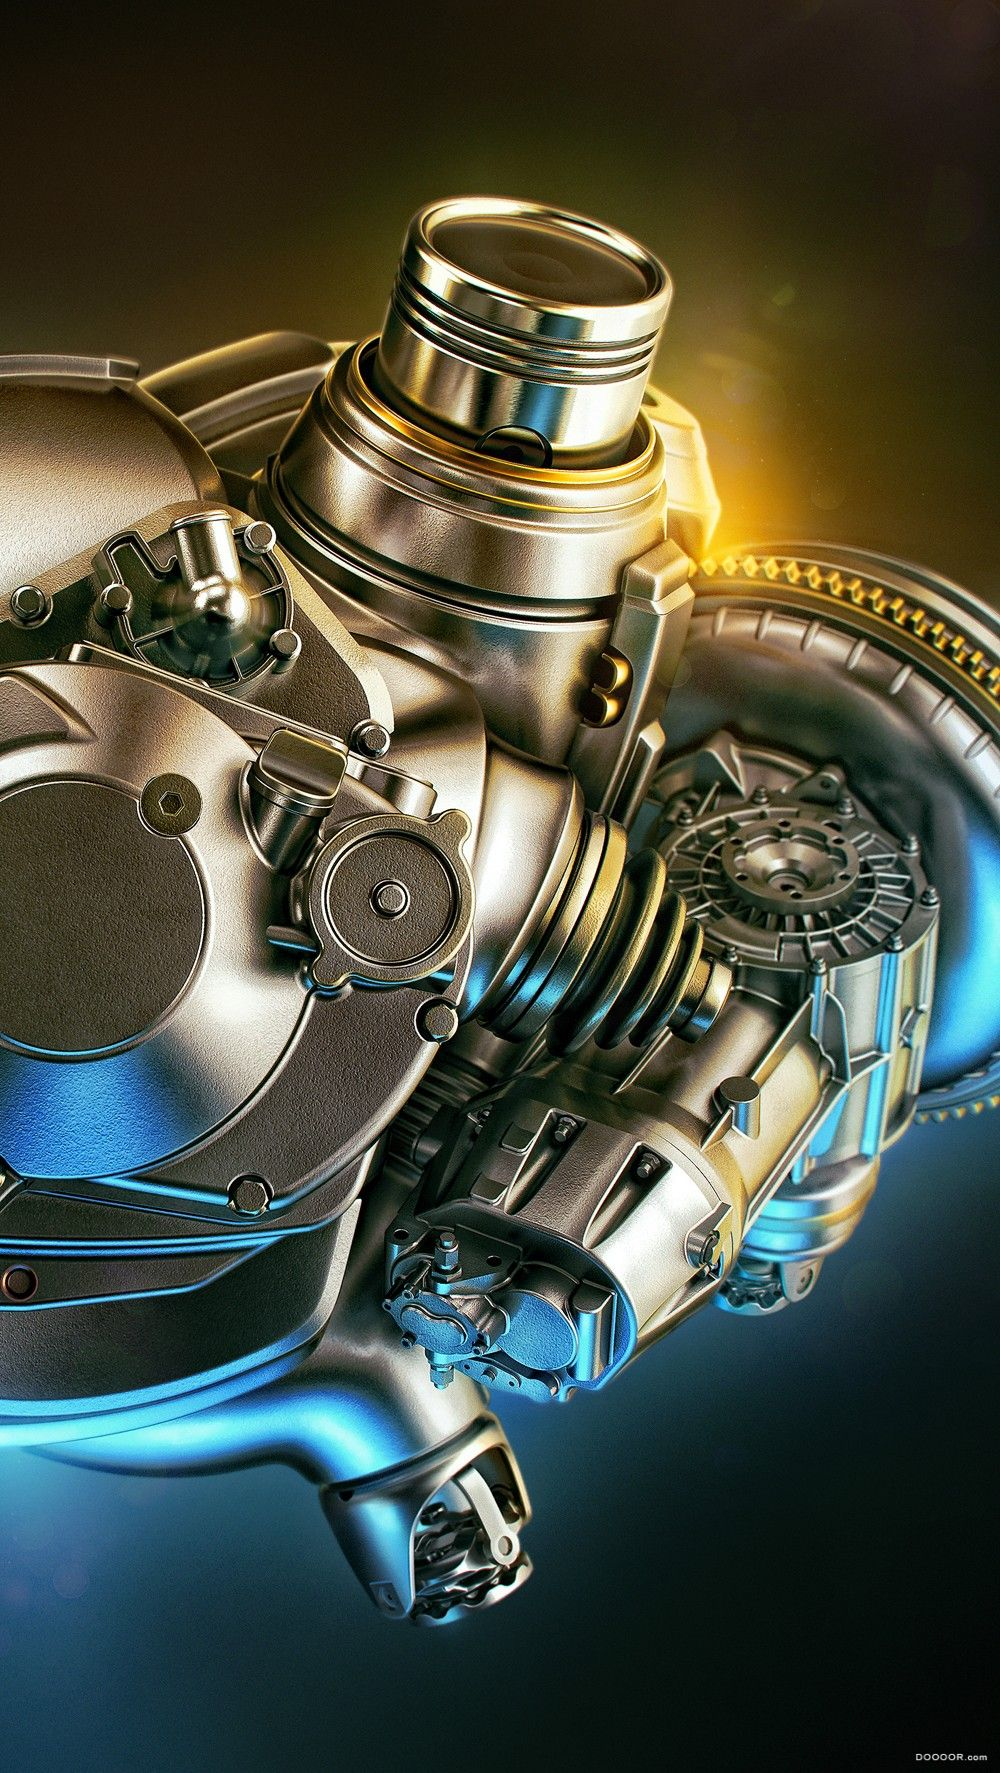 ACURA ENGINE机械心脏极品发动机 [6P] (2).jpg Industrial